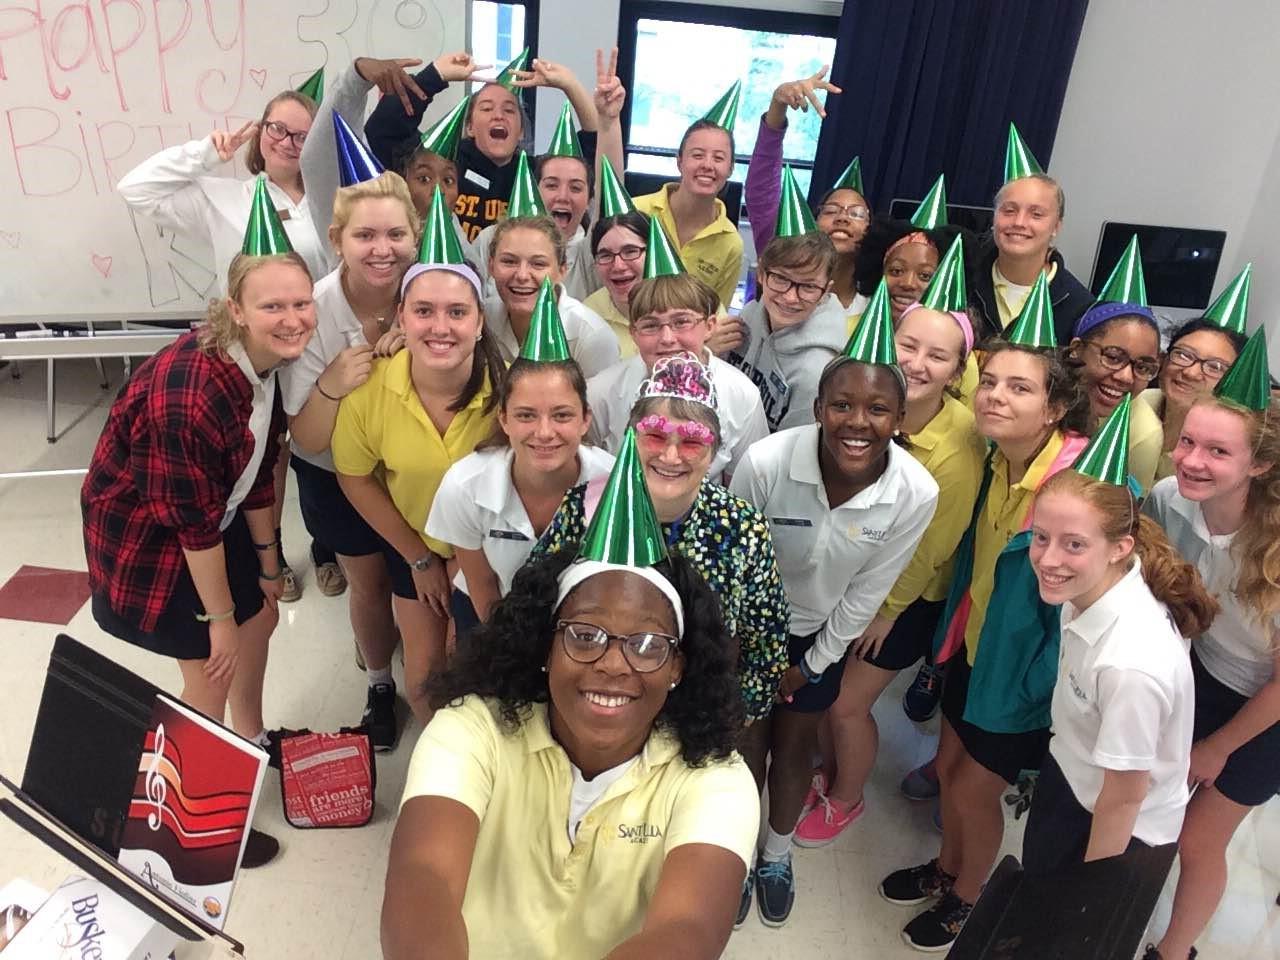 SUA students celebrate beloved teacher Kathy Backherms' birthday!